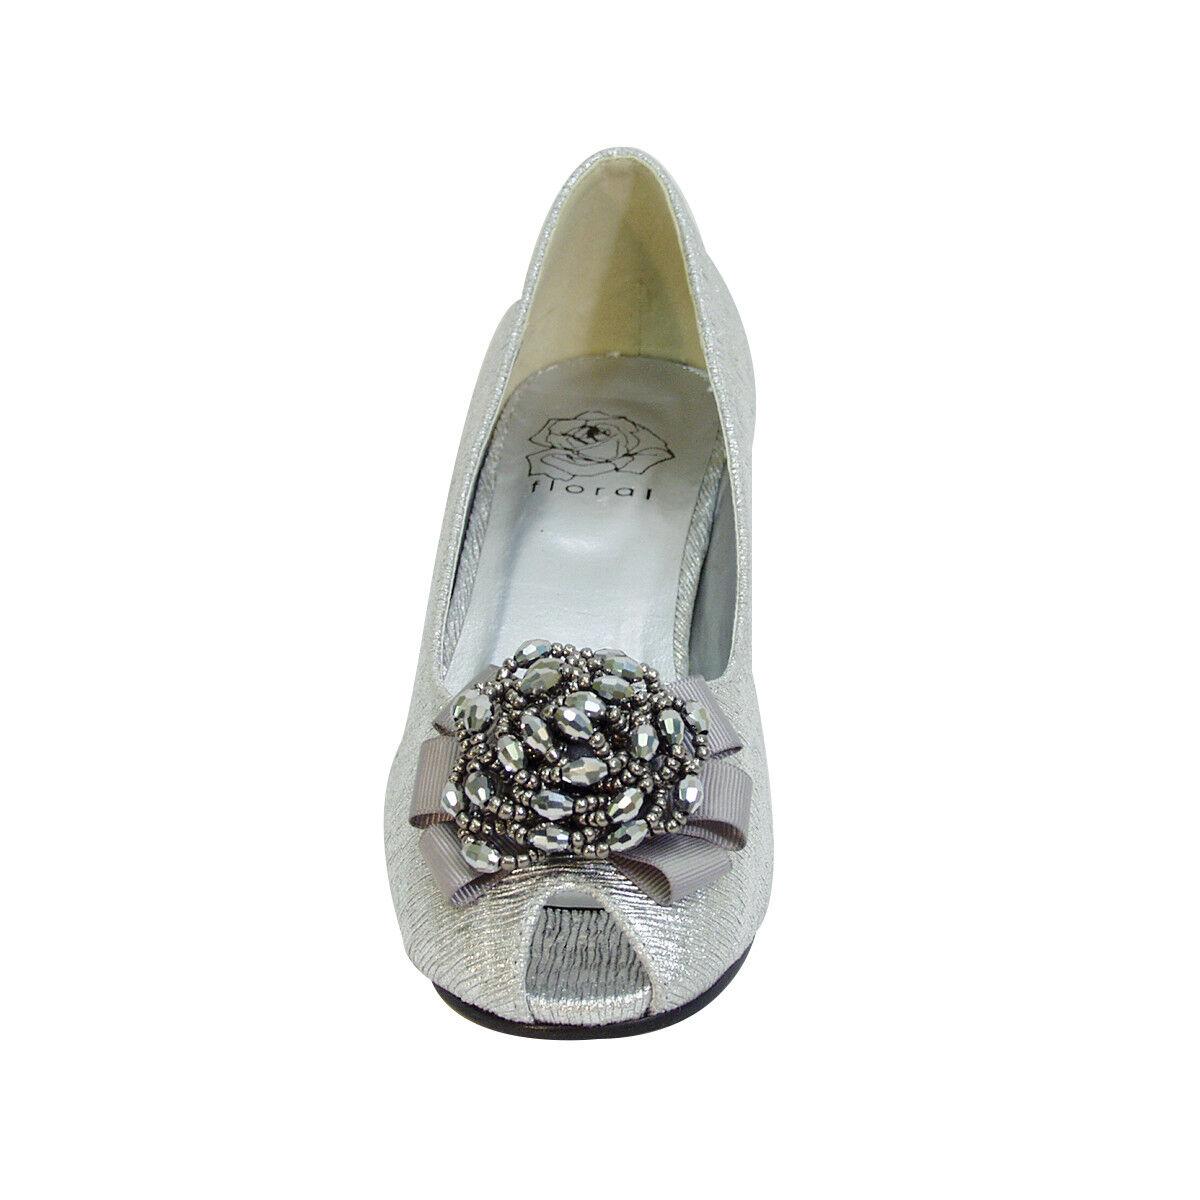 FIC FLORAL Allie Pump damen Wide Width Peep Toe Dress Pump Allie for Wedding, Prom, Dinner c4e5ff